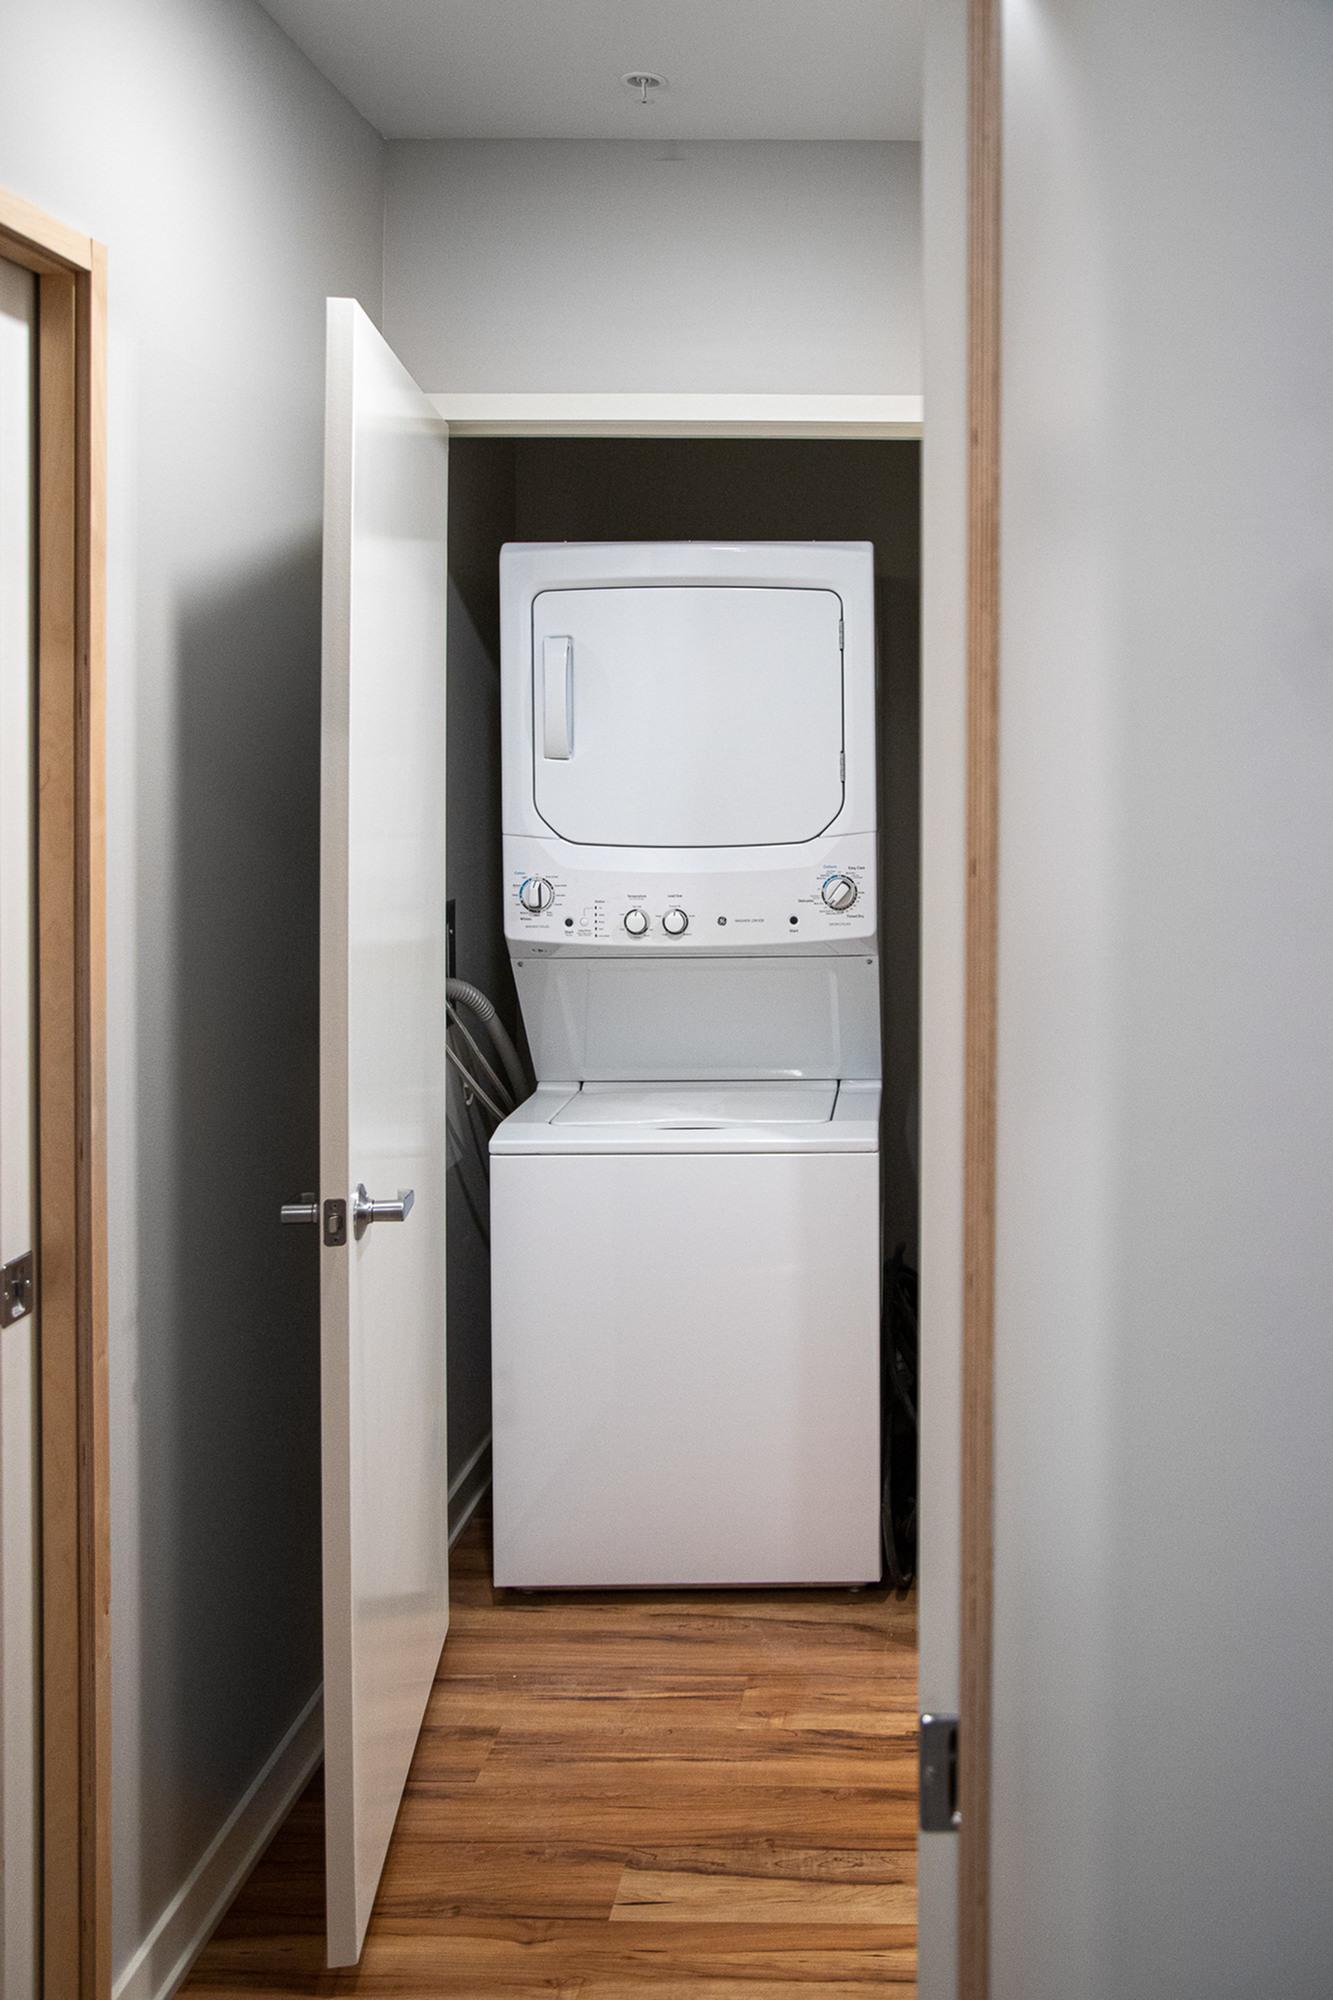 In Unit Washer & Dryer